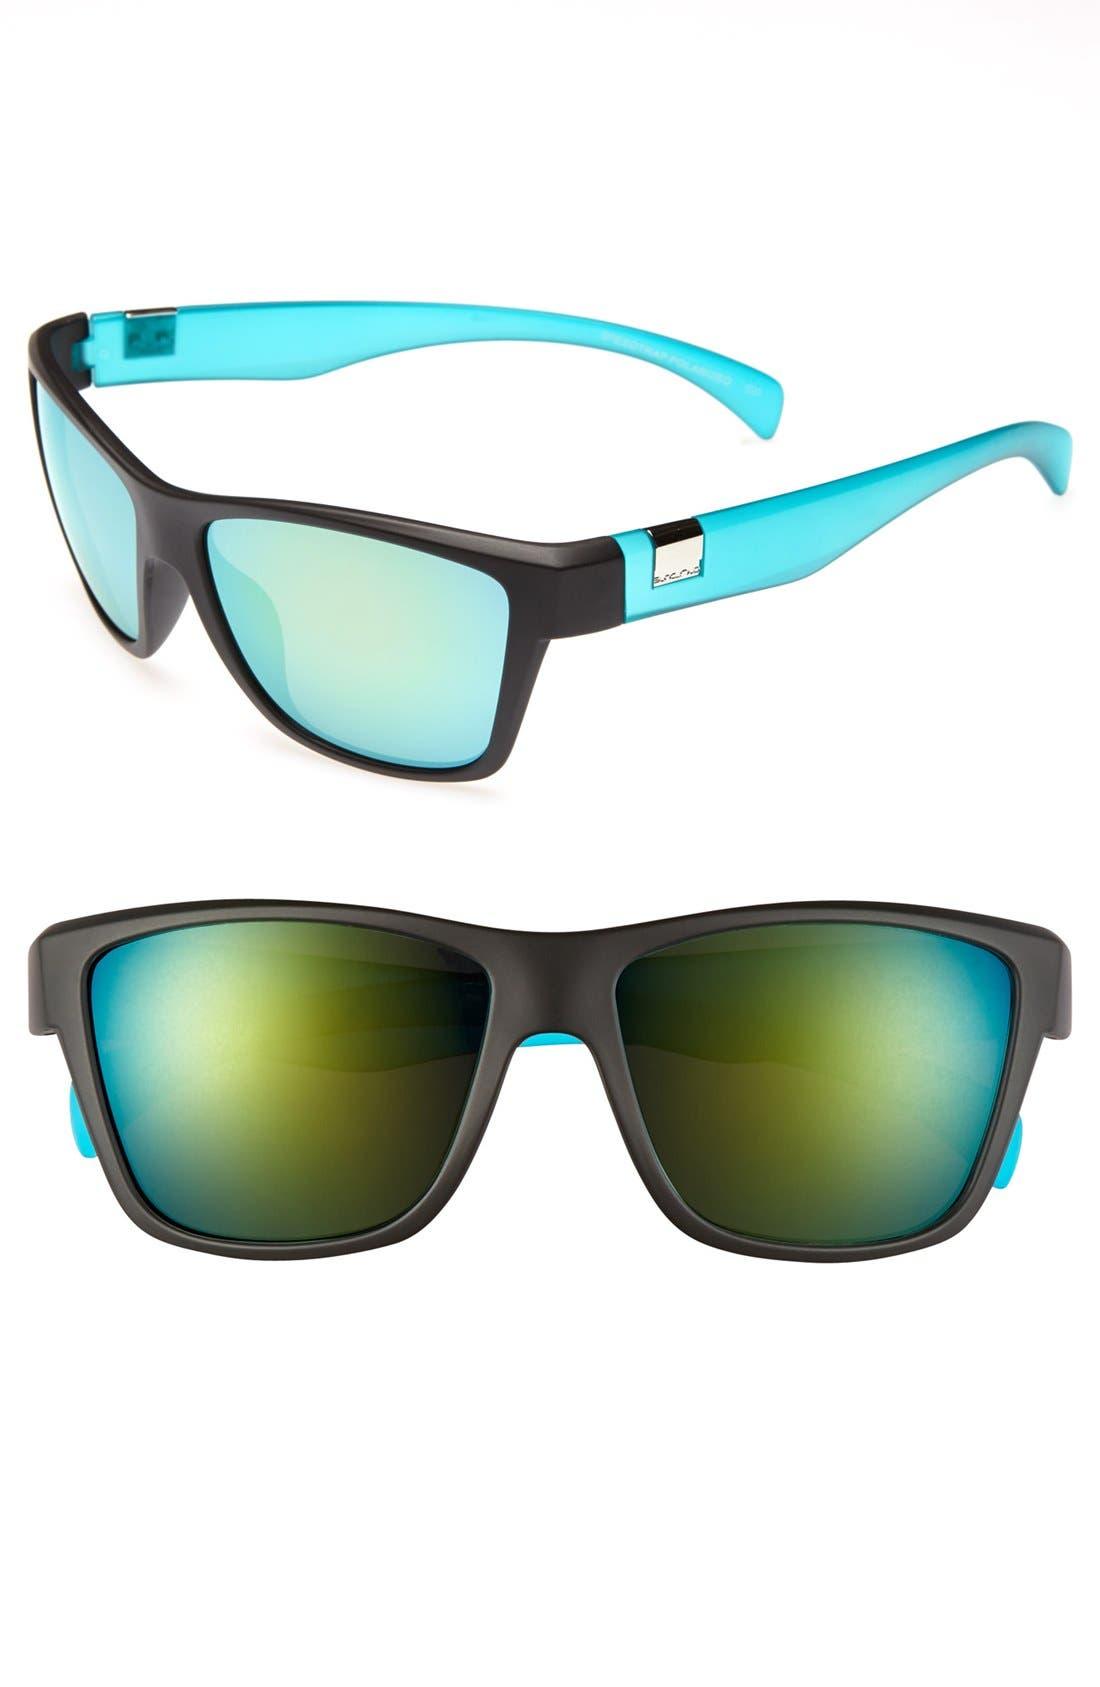 Alternate Image 1 Selected - Suncloud 'Speedtrap' Sunglasses